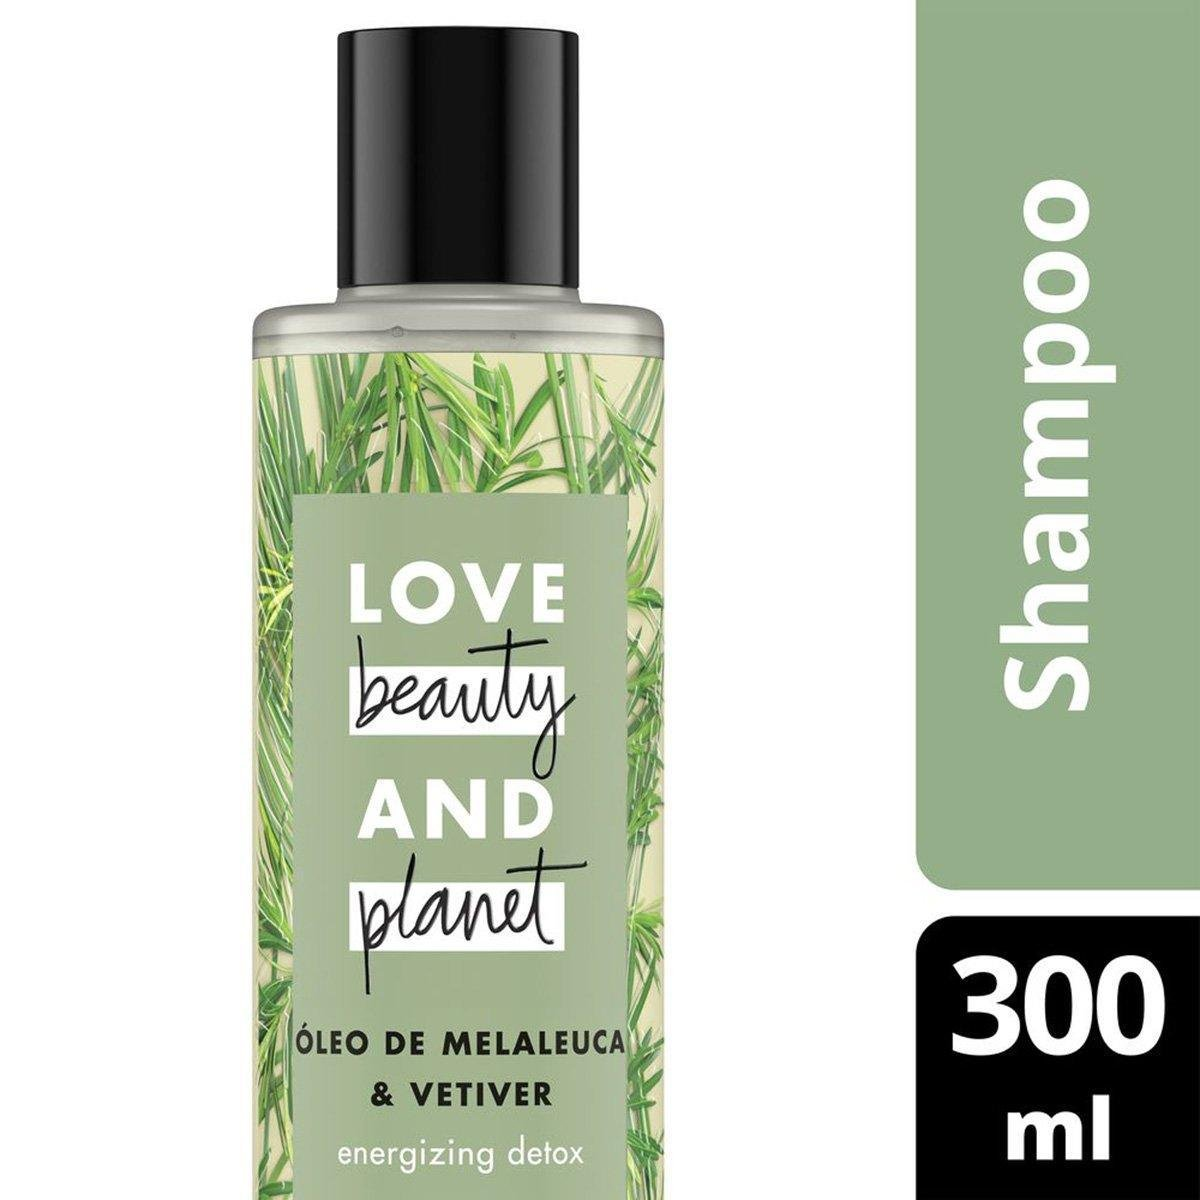 Shampoo Energizing Detox Óleo de Melaleuca & Vetiver Love Beauty and Planet 300ml